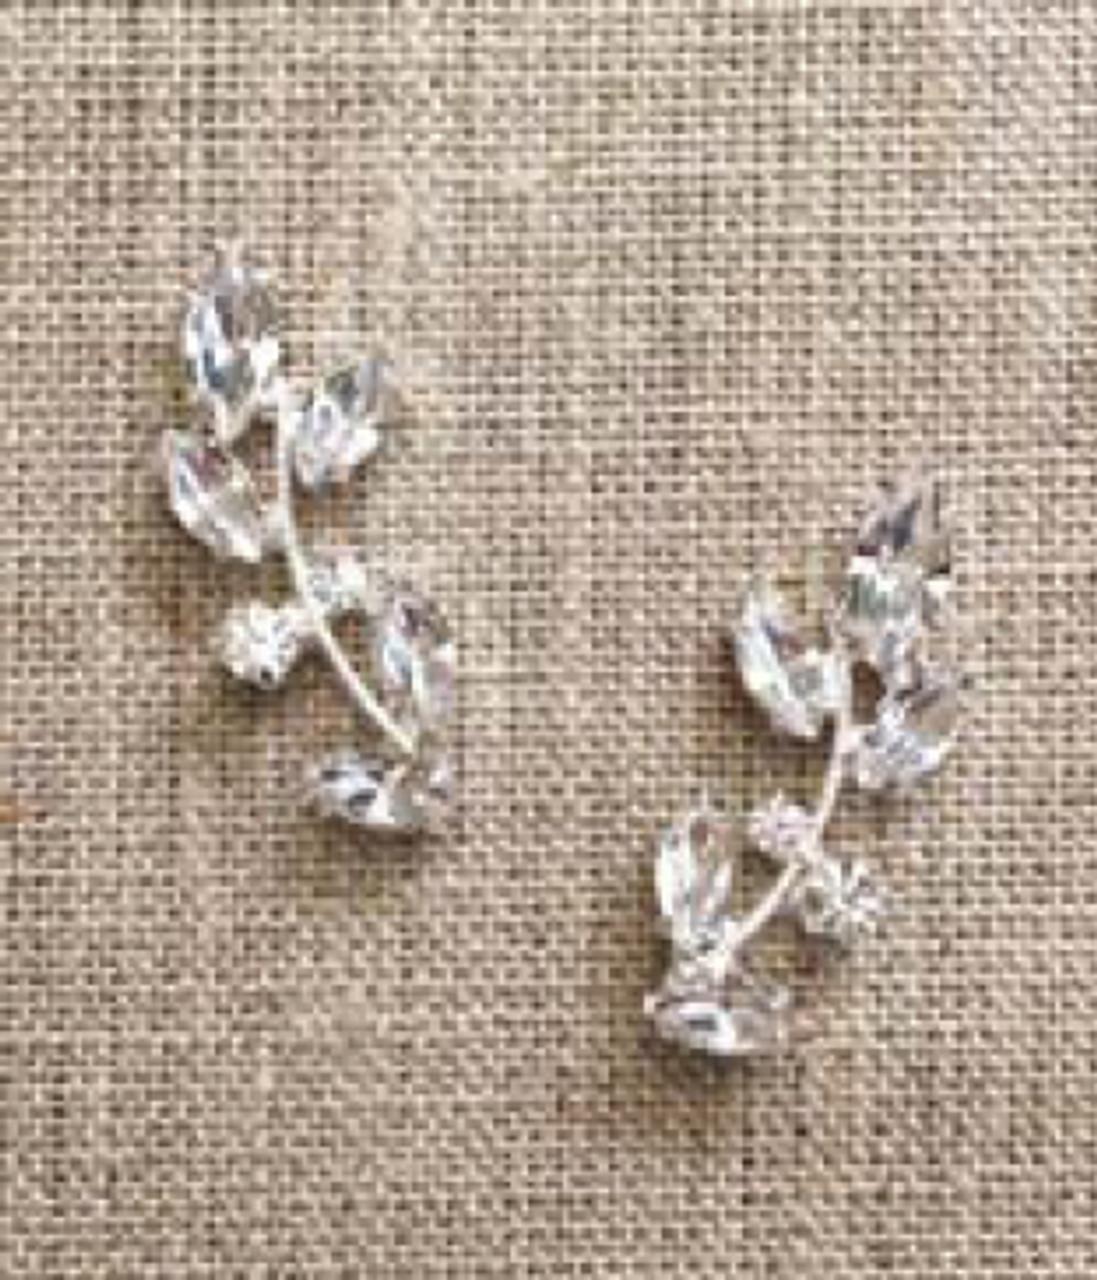 Bel Aire Bridal Earrings EA262 - Rhinestone drop earrings